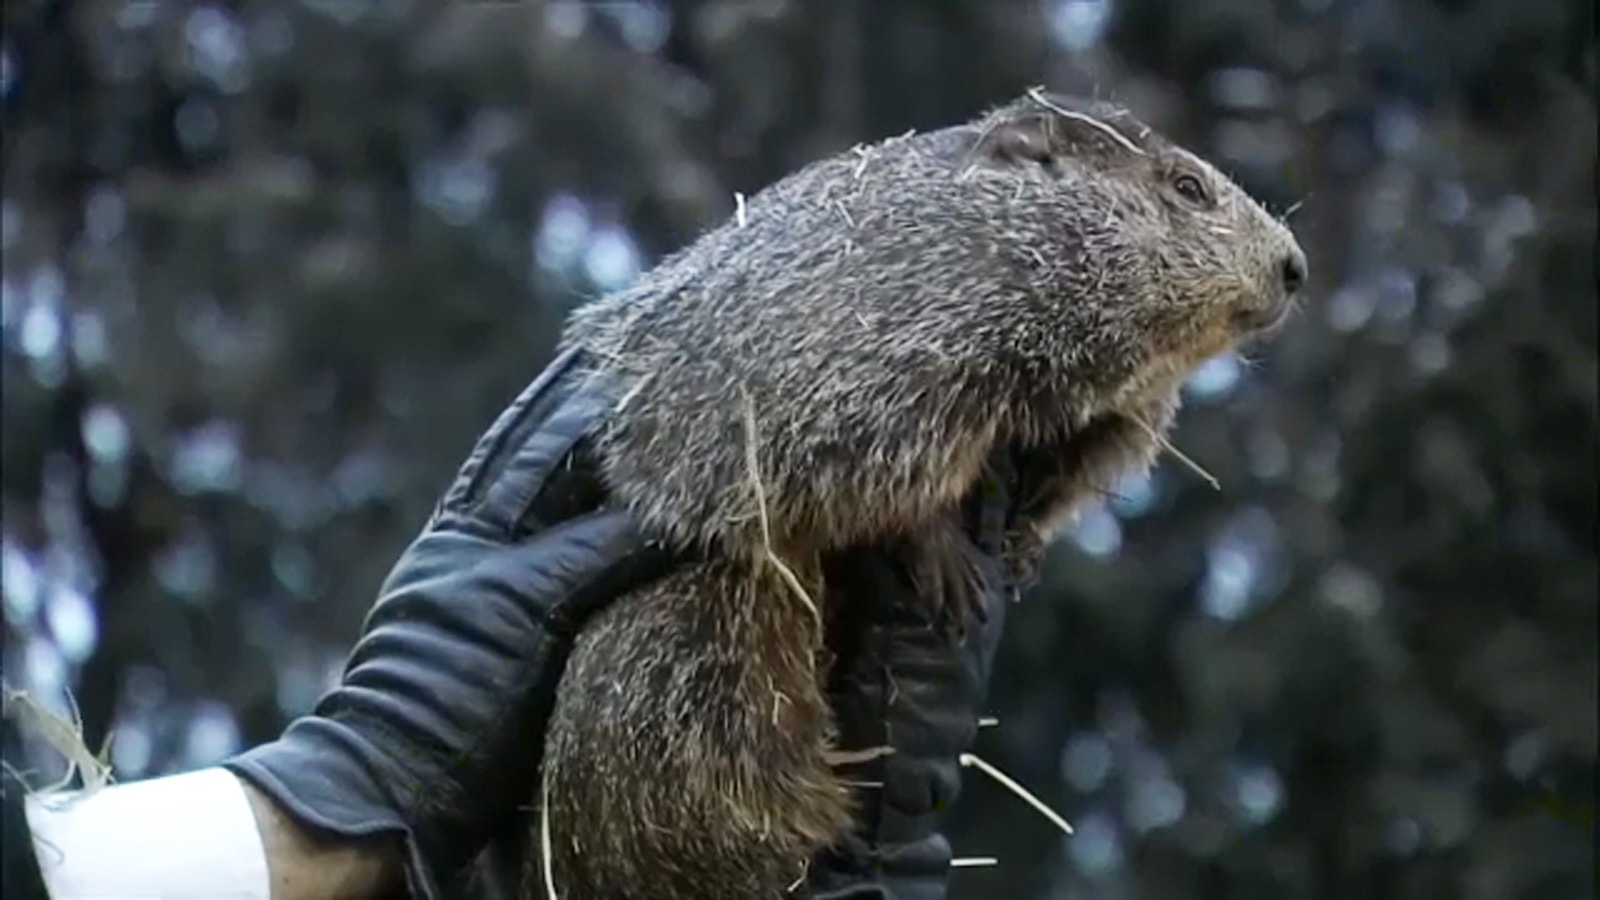 Punxsutawney Phil, Groundhog Day